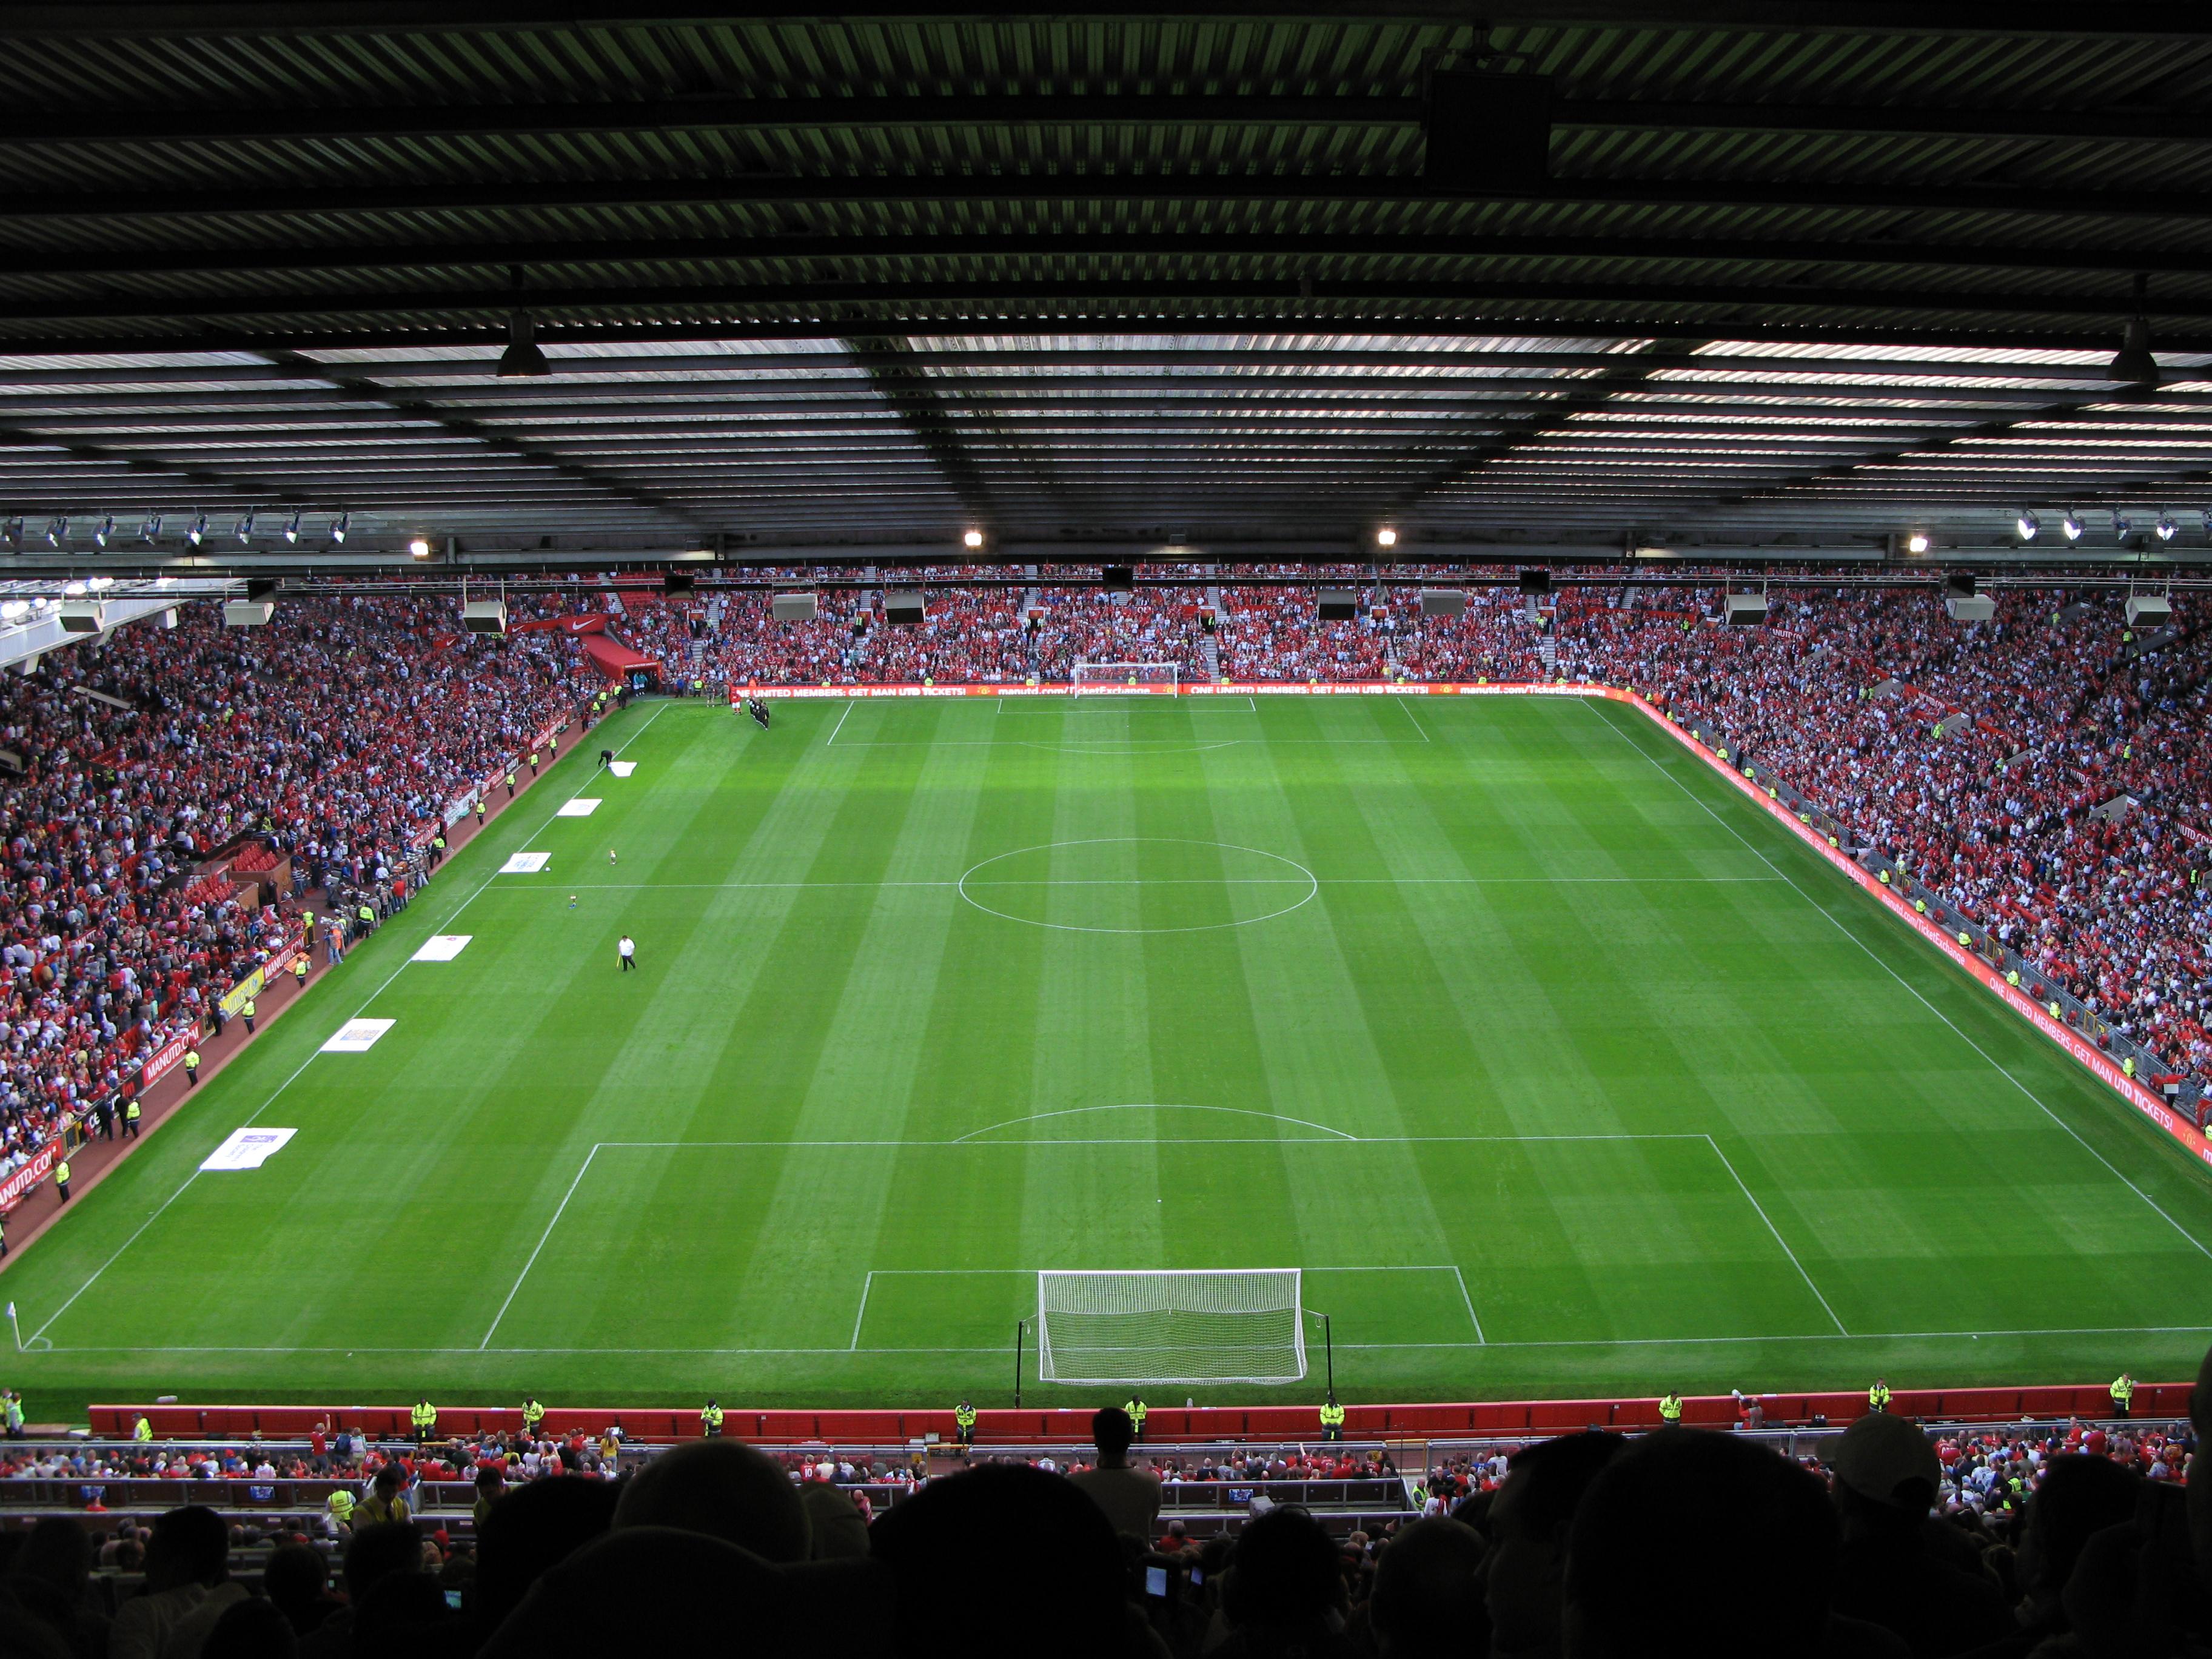 File:Old Trafford 7.jpg - Wikimedia Commons